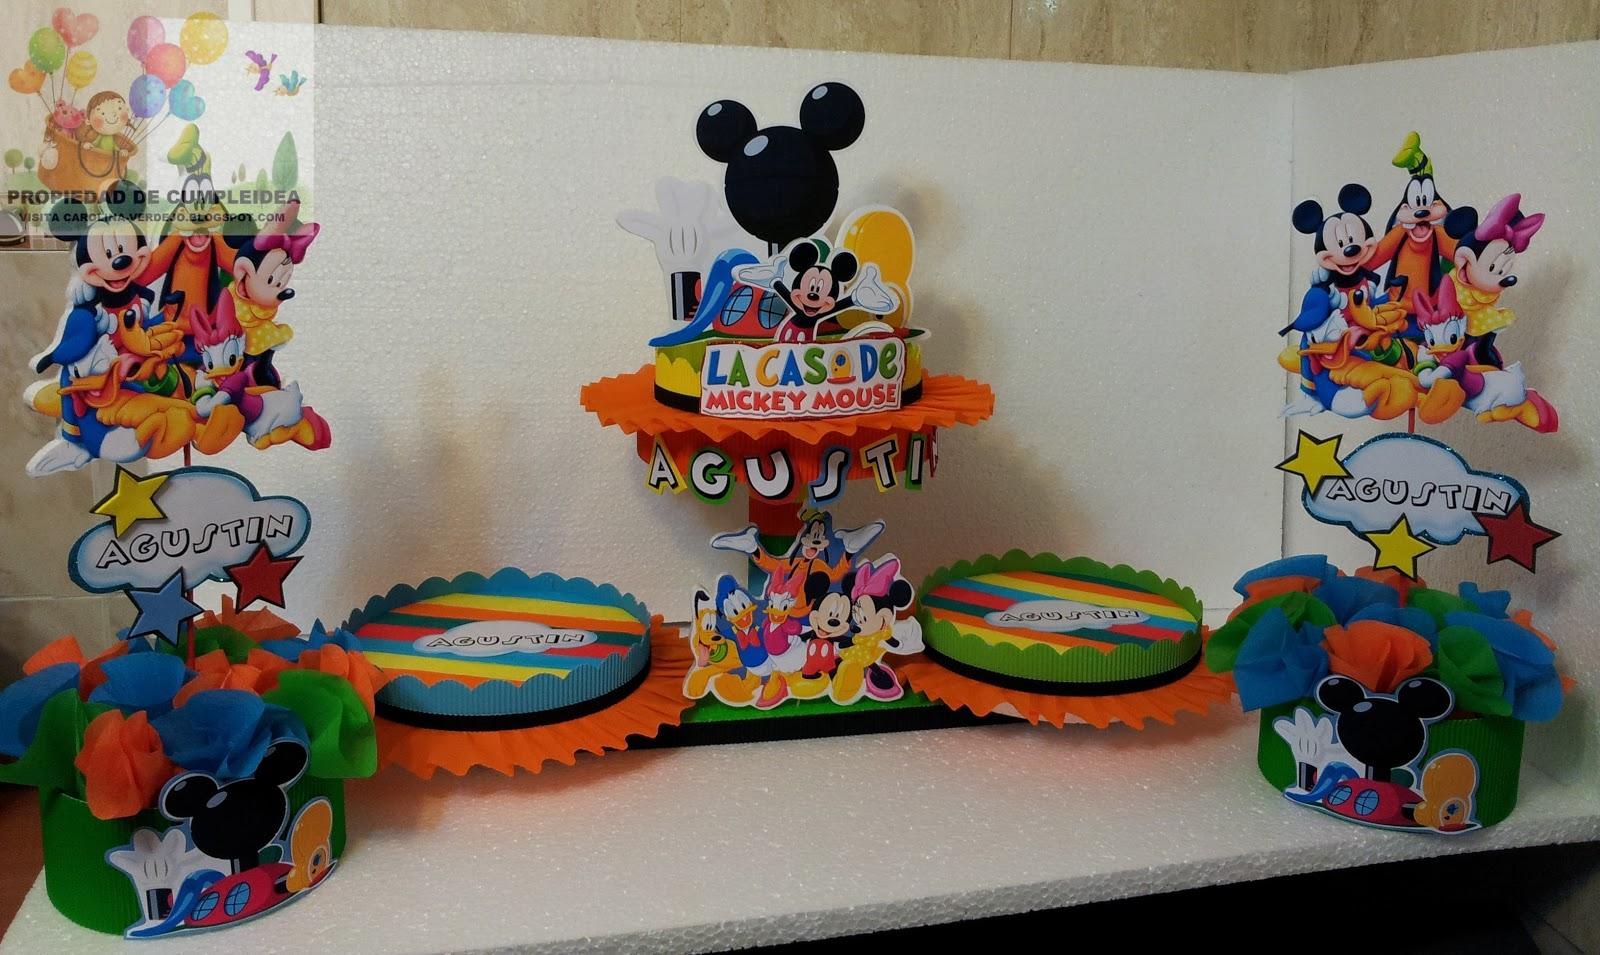 Fotos de decoraciones de mini mouse tattoo design bild - Decoraciones de fotos ...